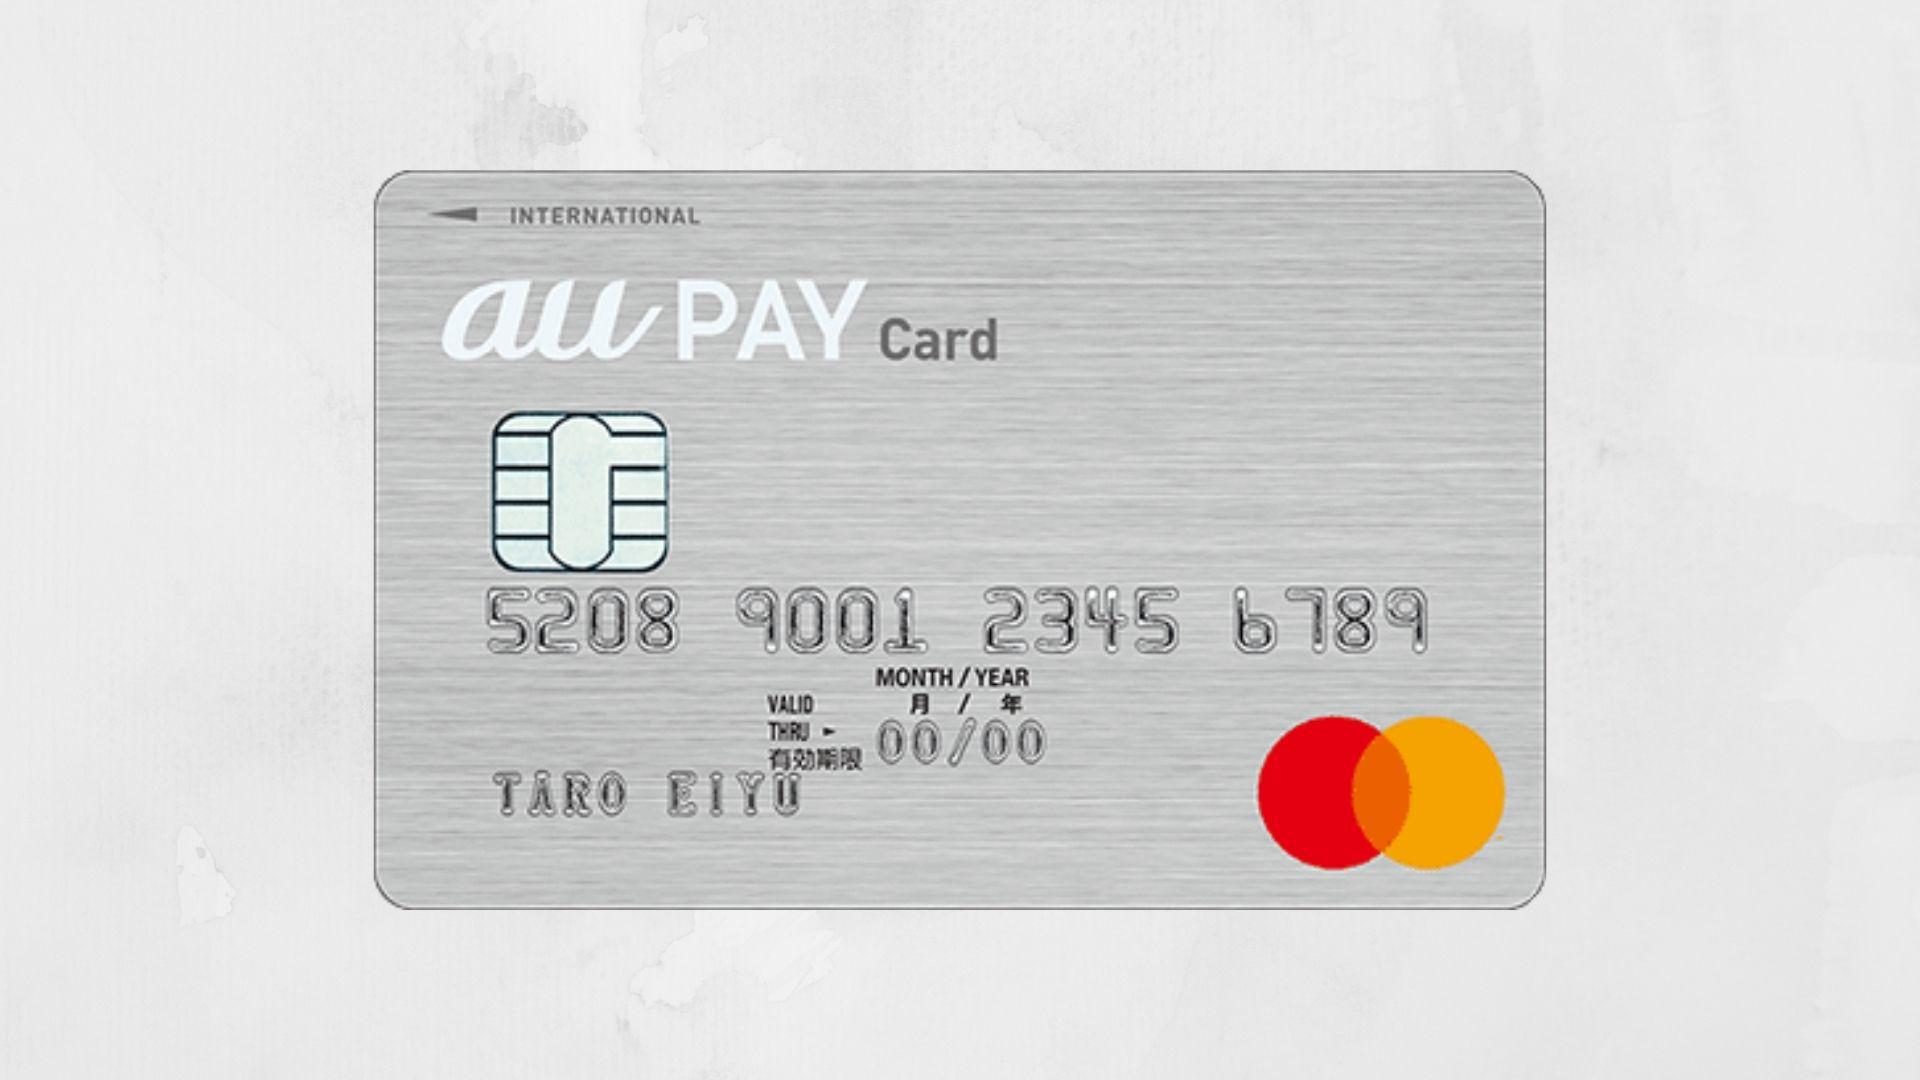 au Payカードの特徴を徹底解説 口コミ評判・メリット・デメリット